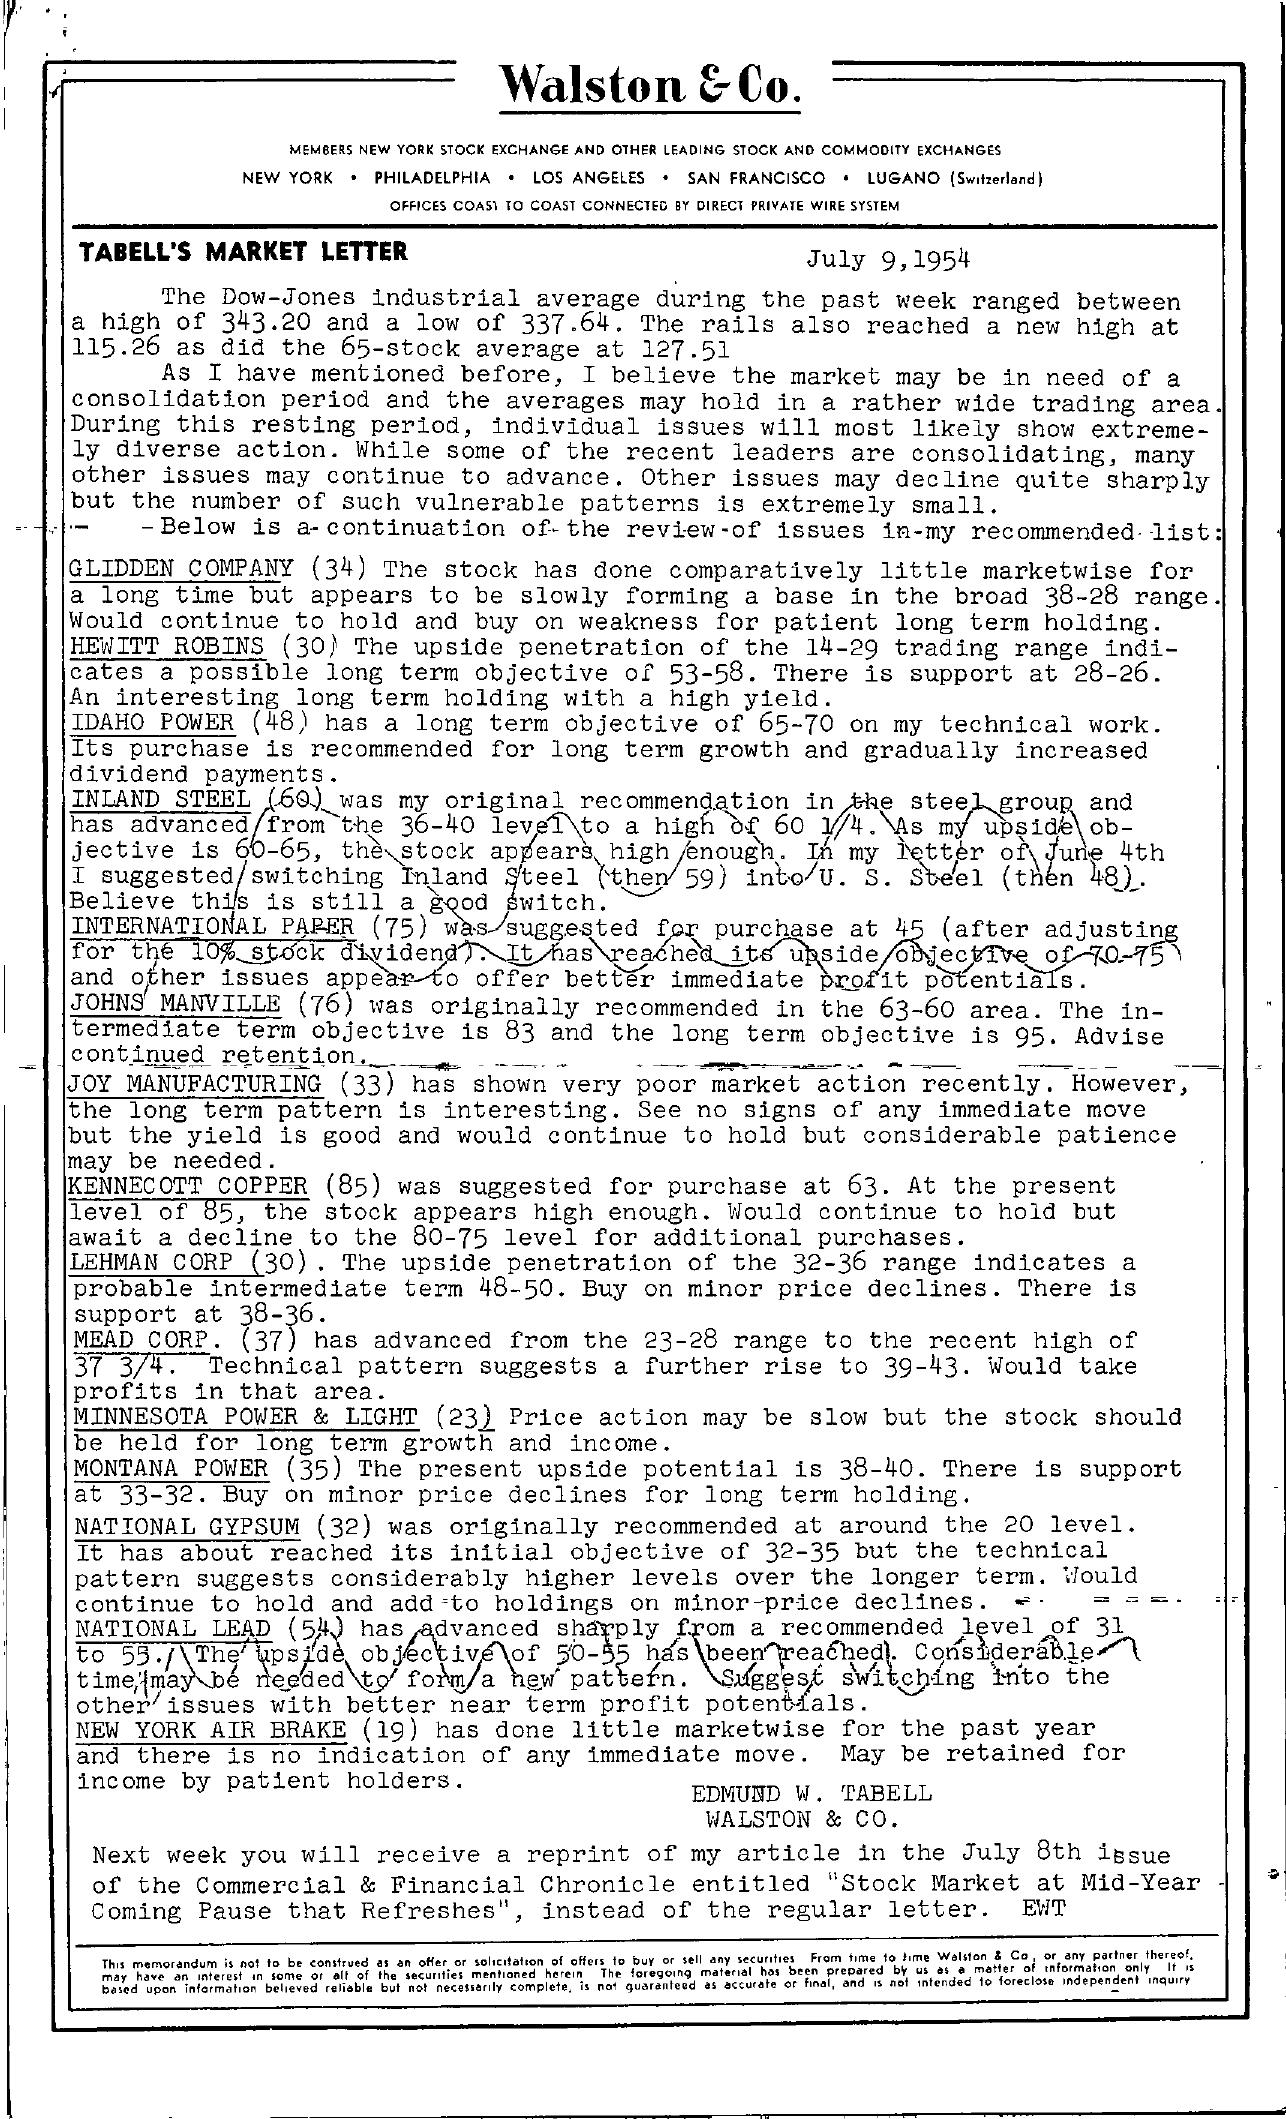 Tabell's Market Letter - July 09, 1954